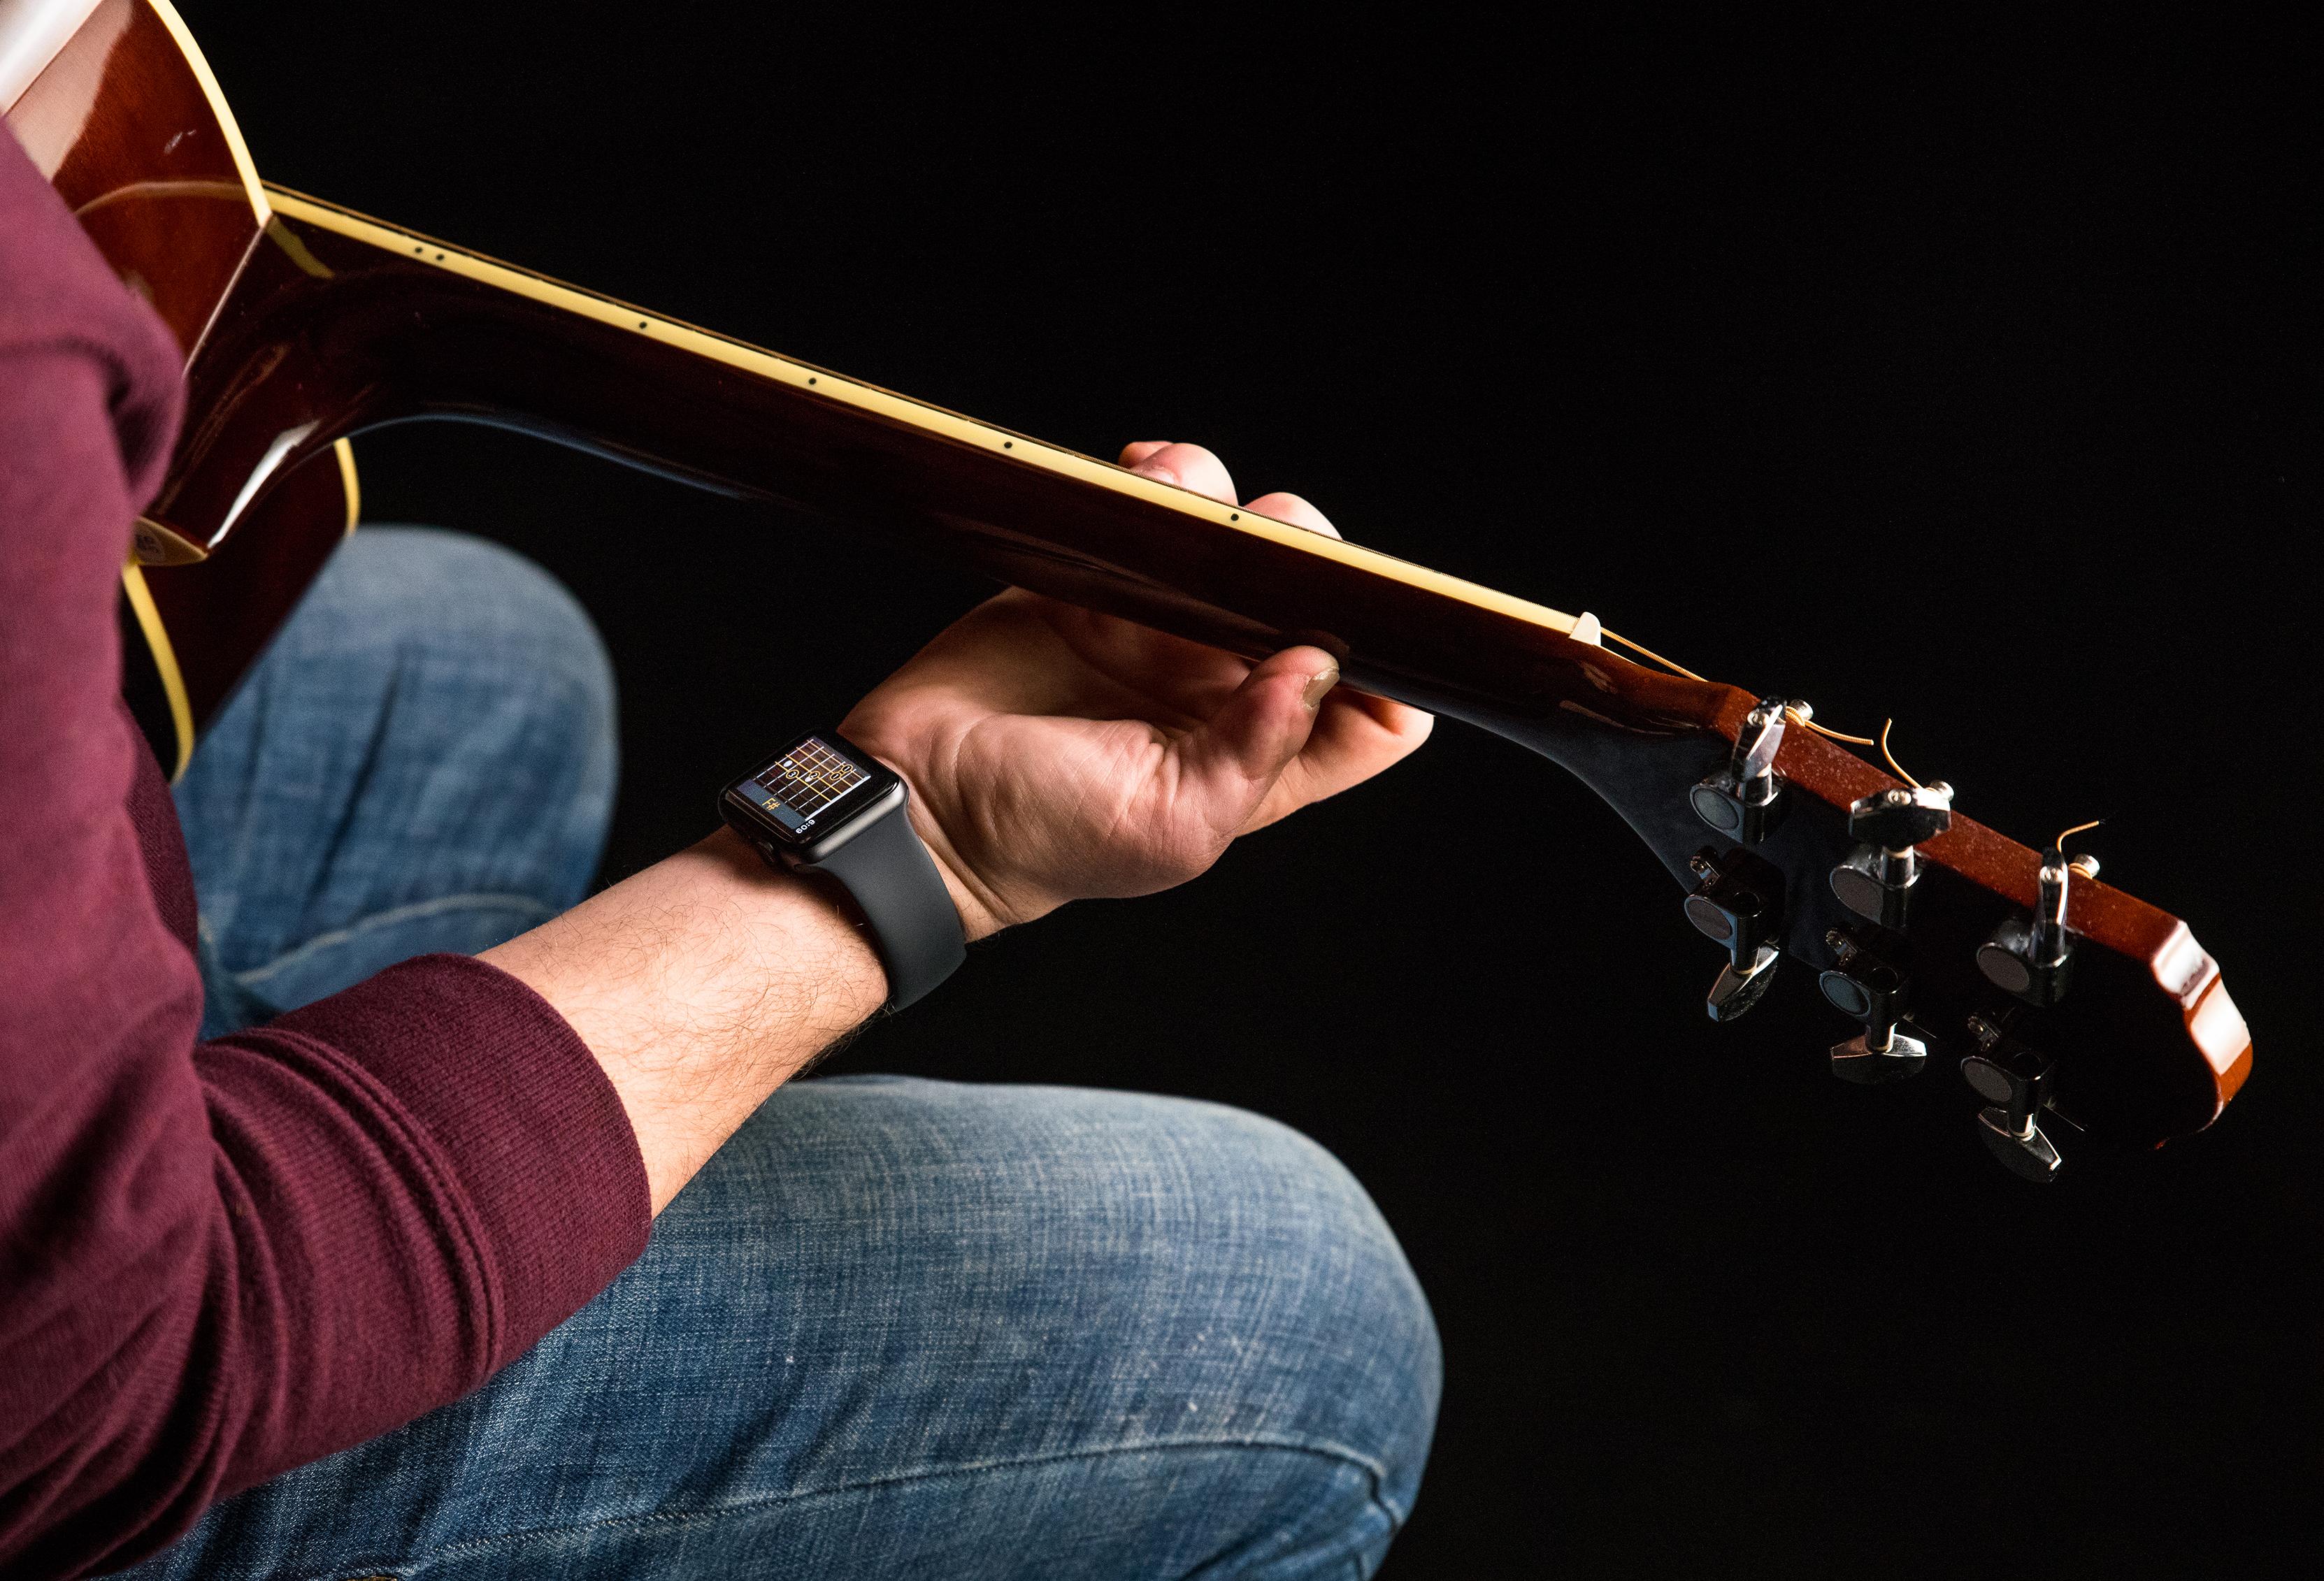 Wristruments puts a personal guitar teacher on your wrist